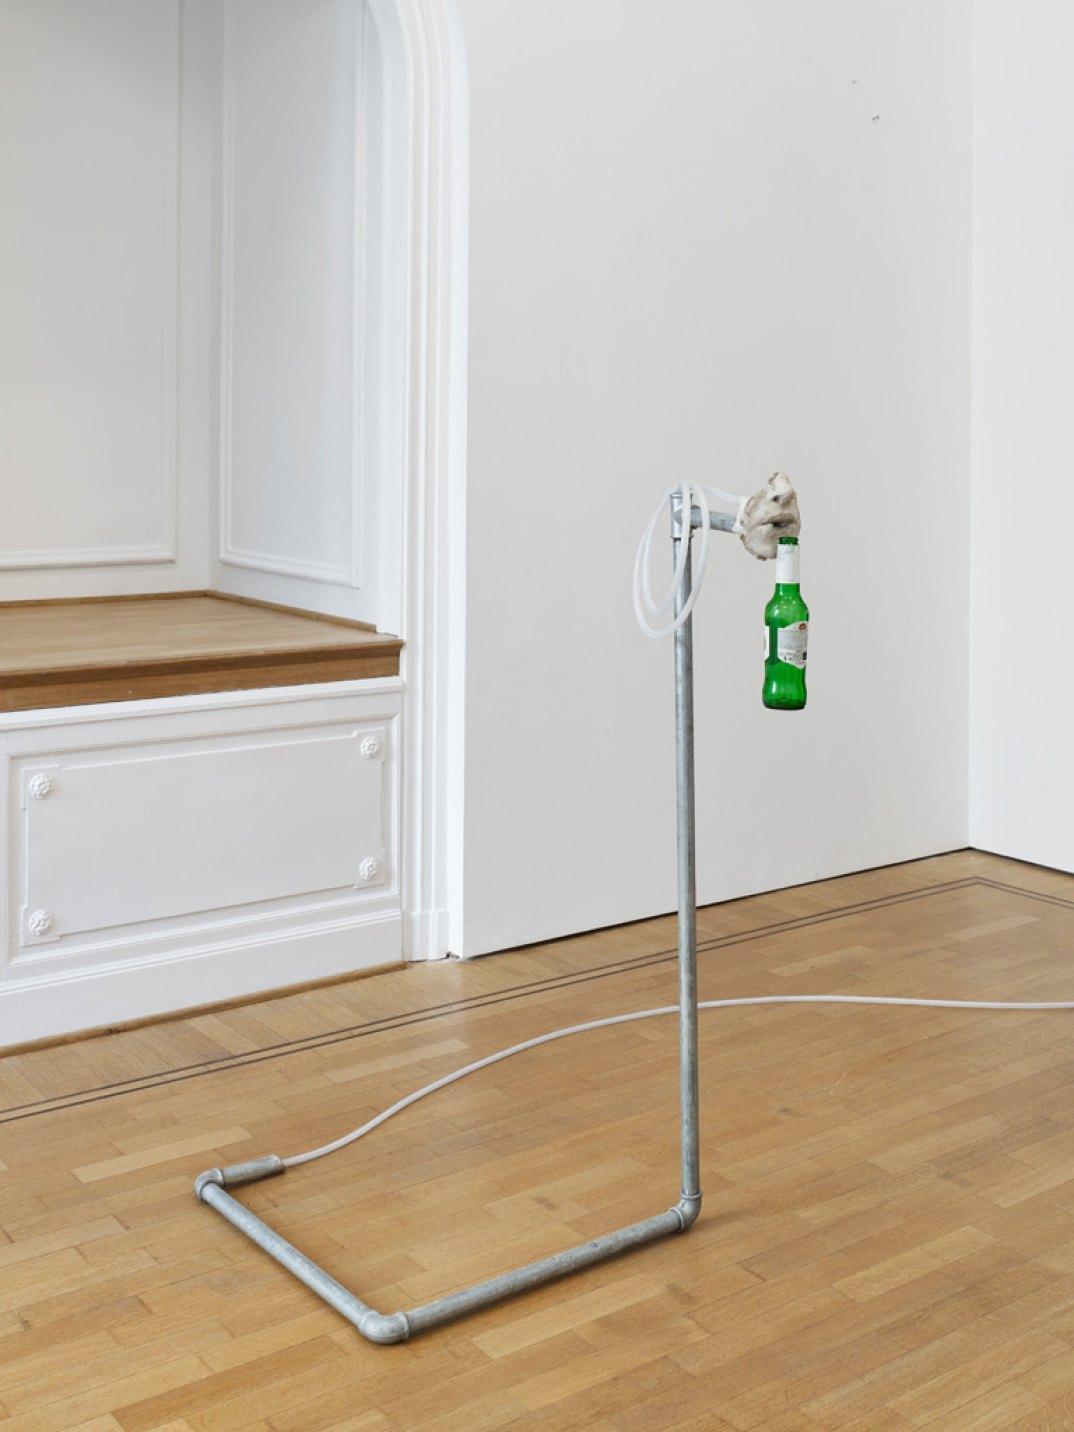 Giulio Delvè,<em>Uff</em>, 2017, jesmonite, air compressor, beer bottle, pipes and  ttings,  exible hydraulic hose, 120 × 60 × 55 cm  - Mendes Wood DM